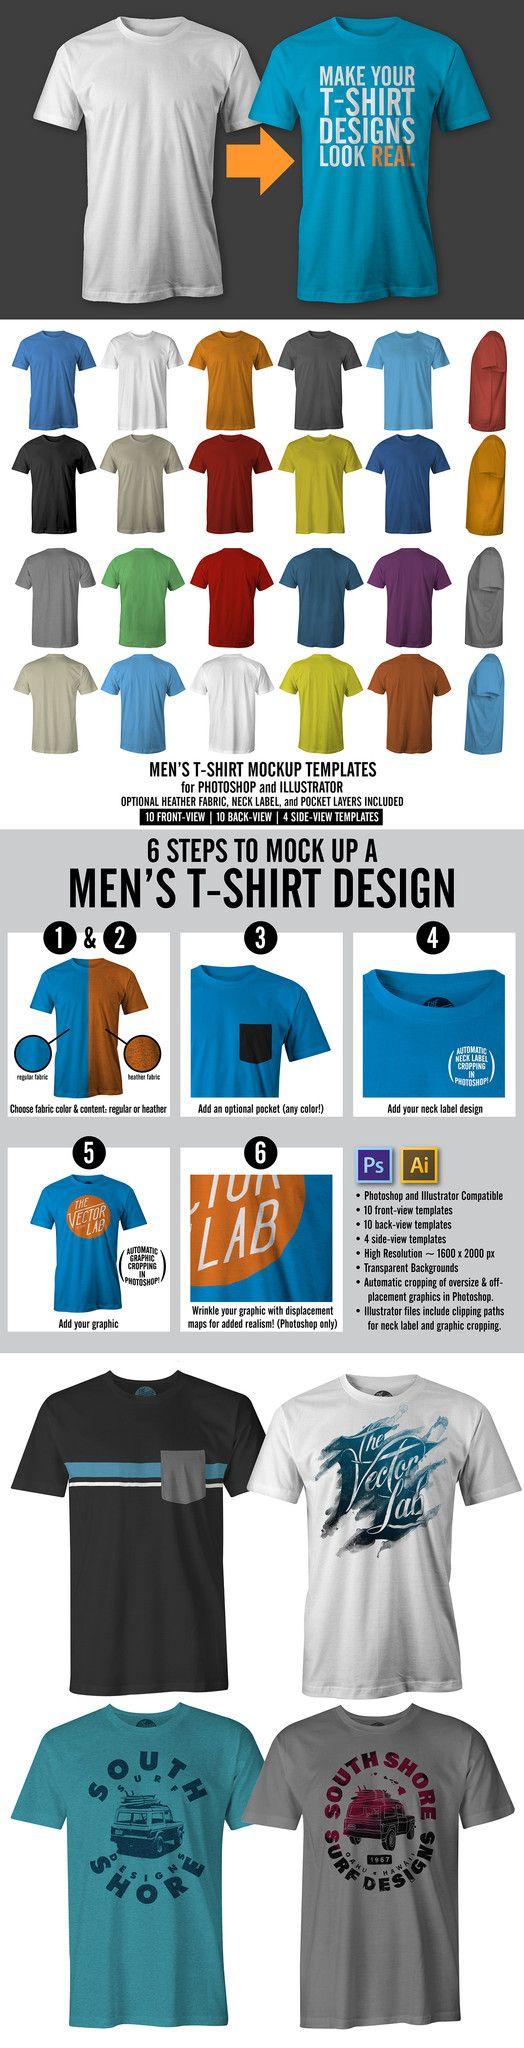 41ca570b Men's T-Shirt Mockup Templates (Version 5.0) | Tees | Mockup ...